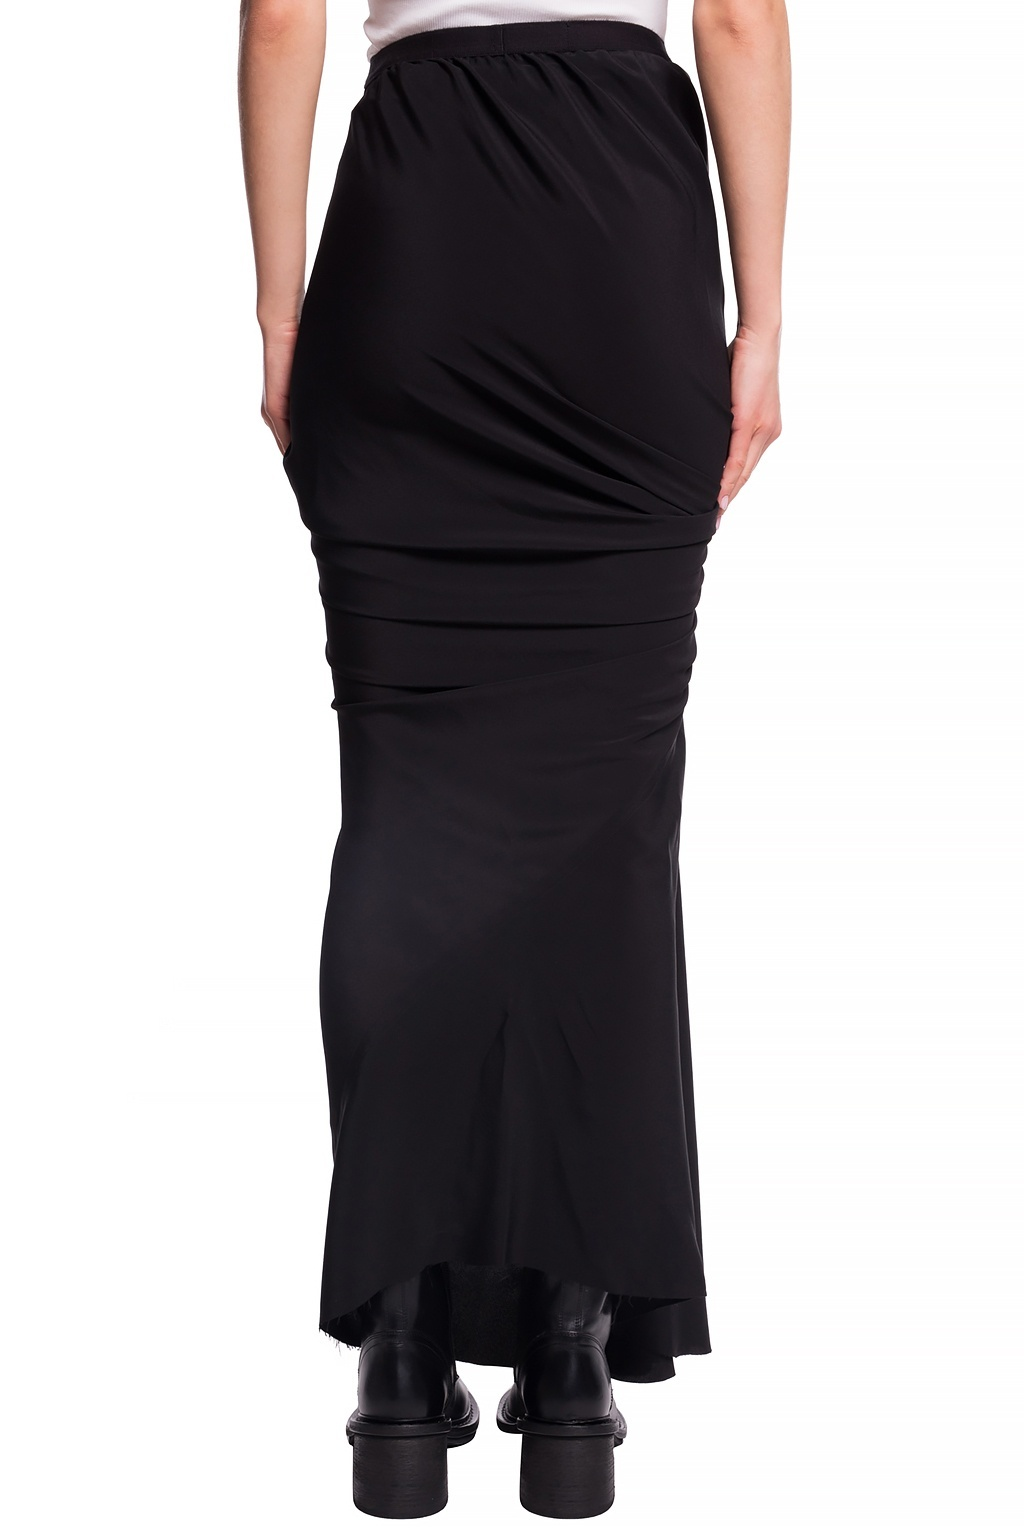 Skirt - Ruched - Black - Sz 40-2